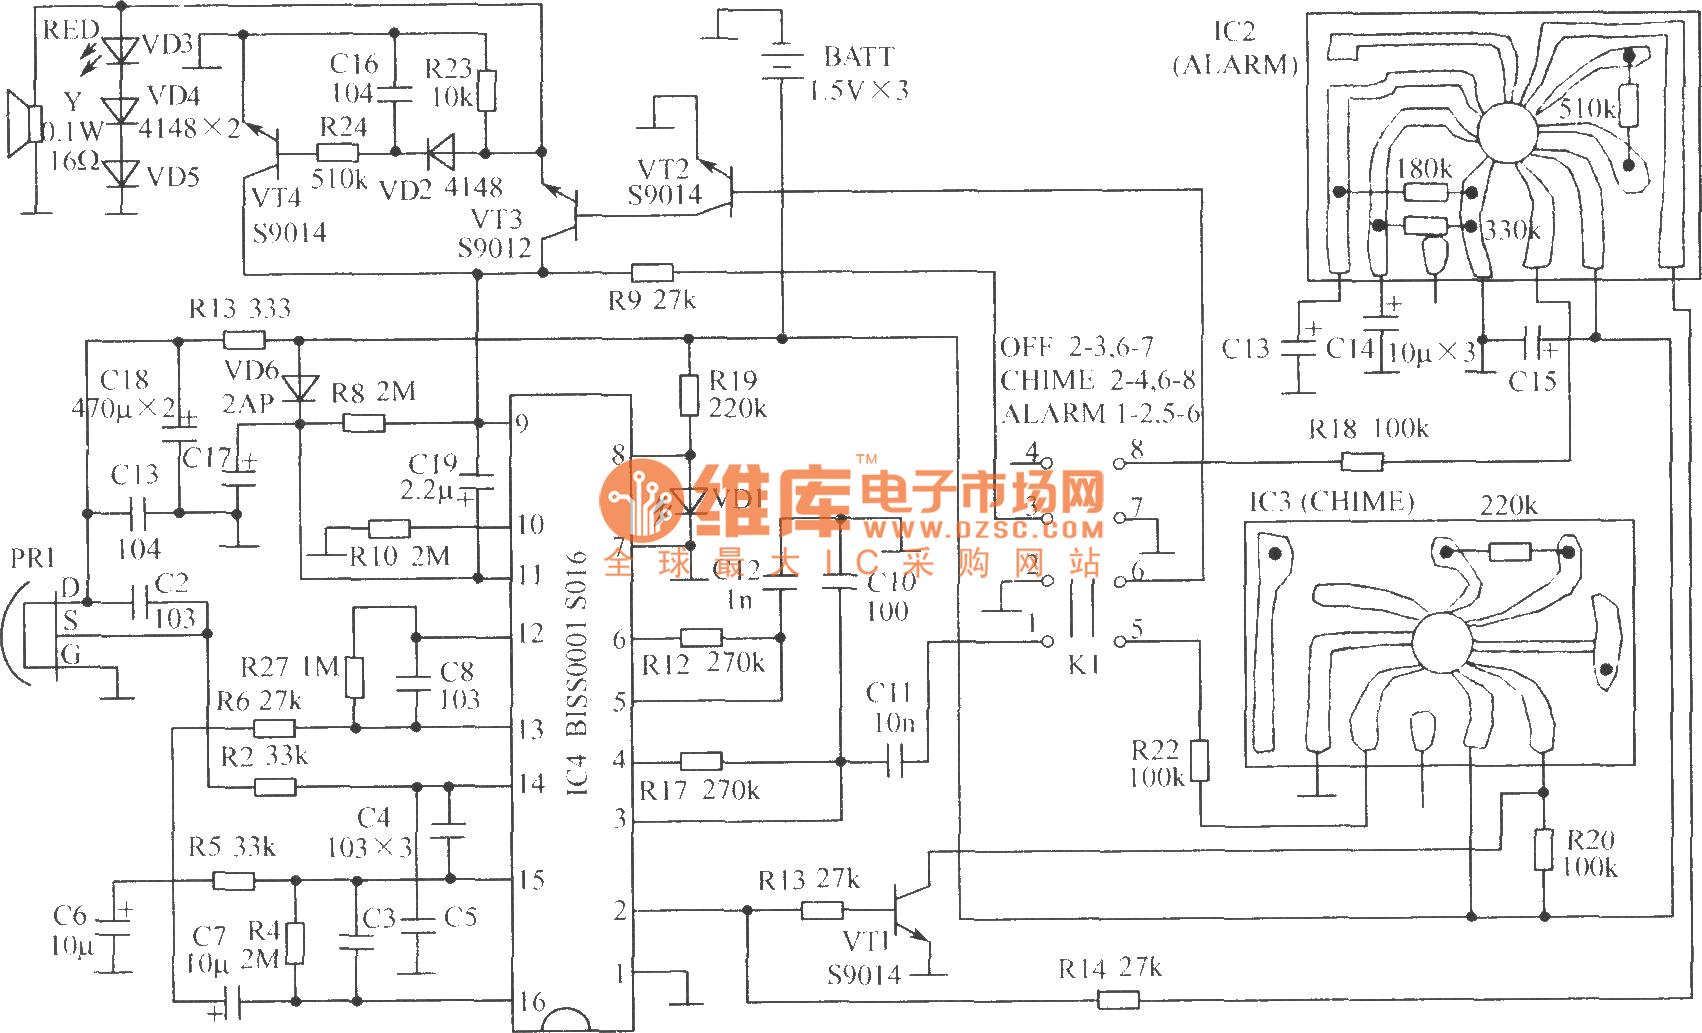 Bell Alarm Circuit Diagram Control Wwwseekiccom Circuitdiagram Amplifiercircuit Themixercircuit